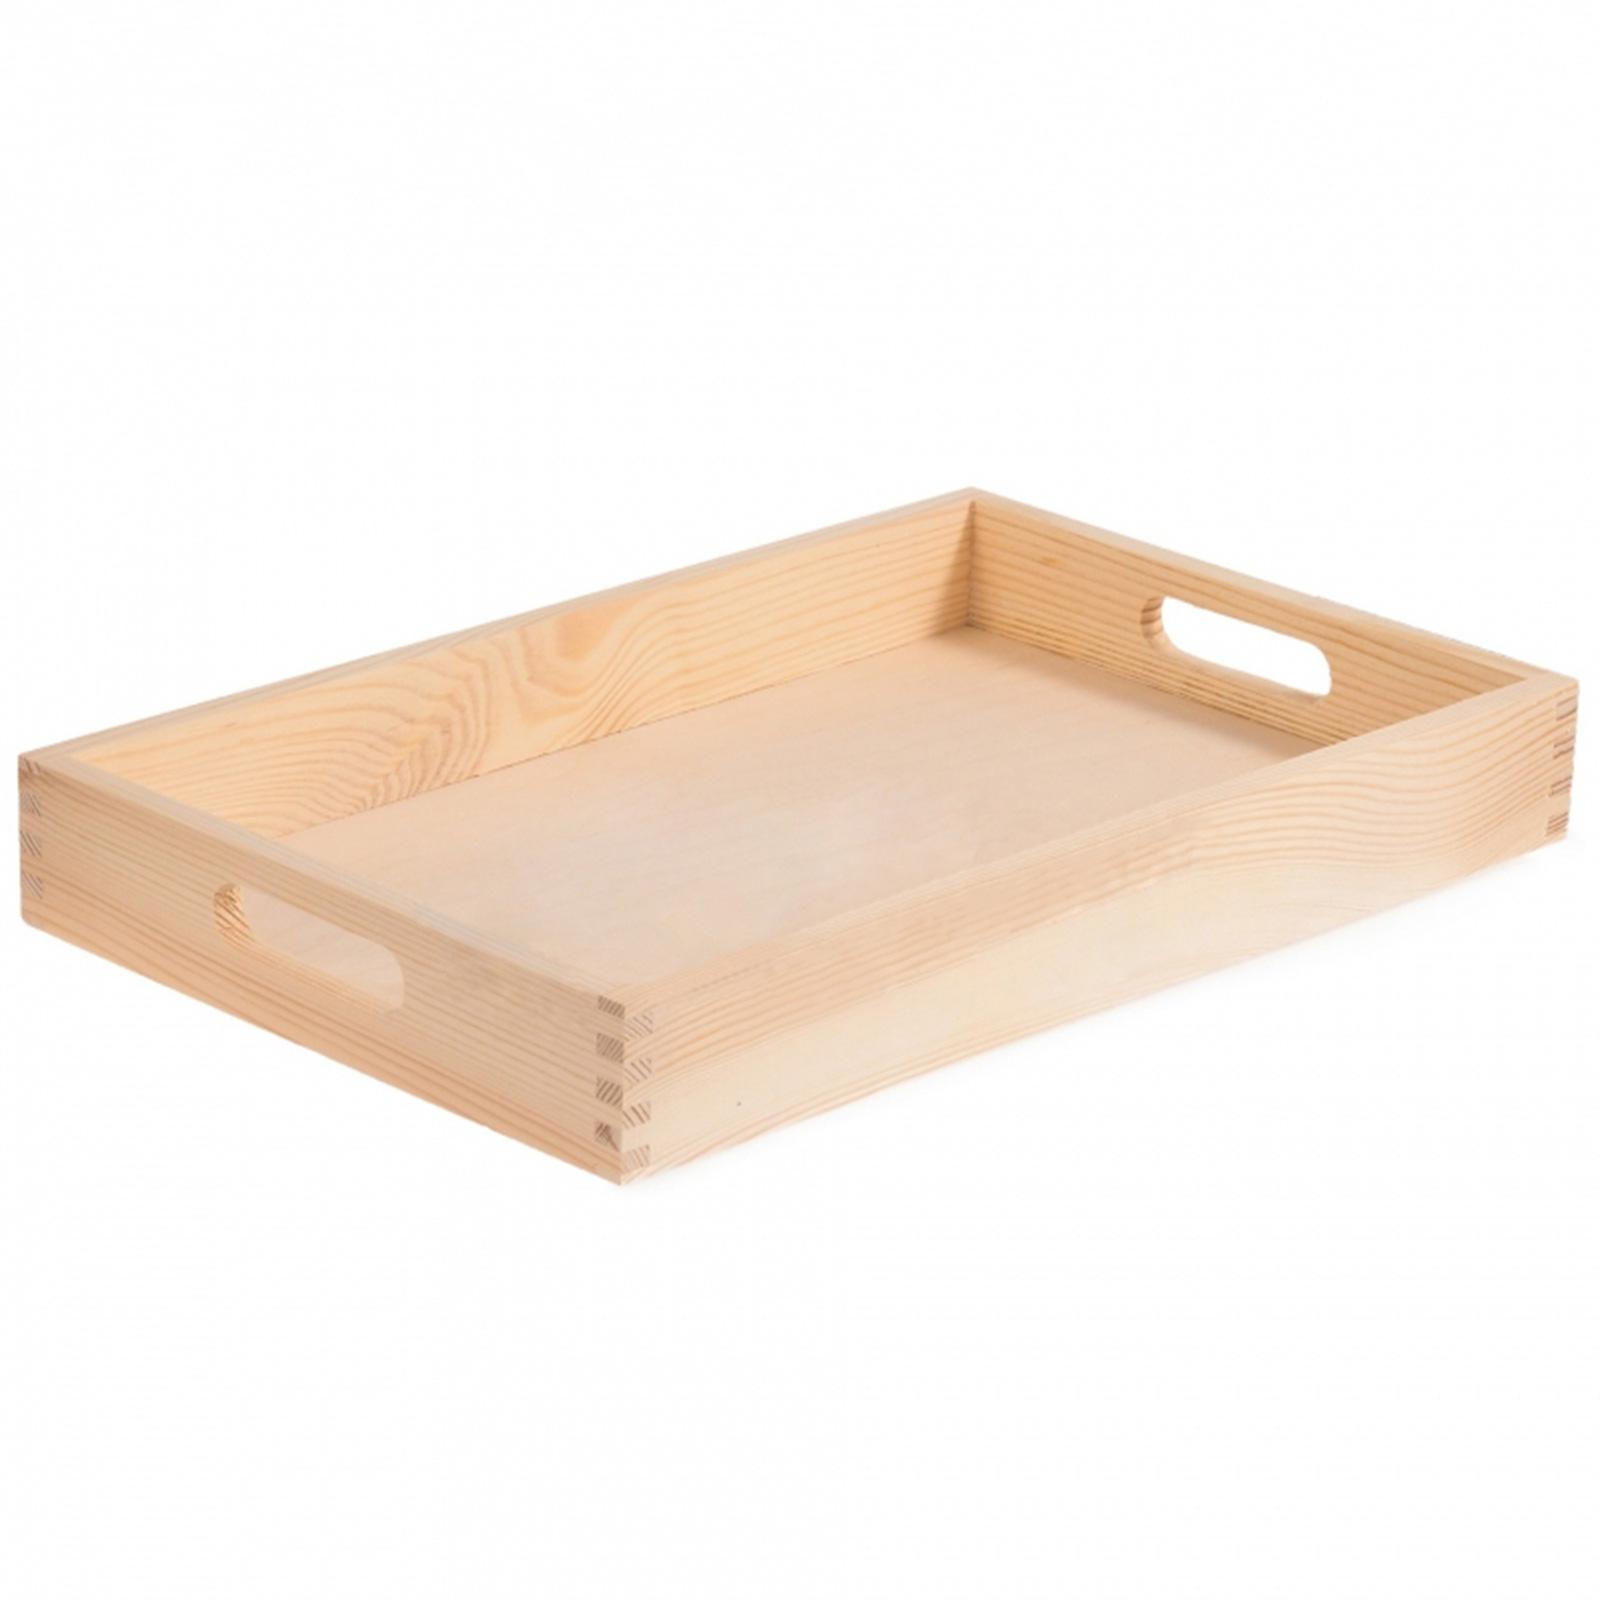 Plain Wooden Trays